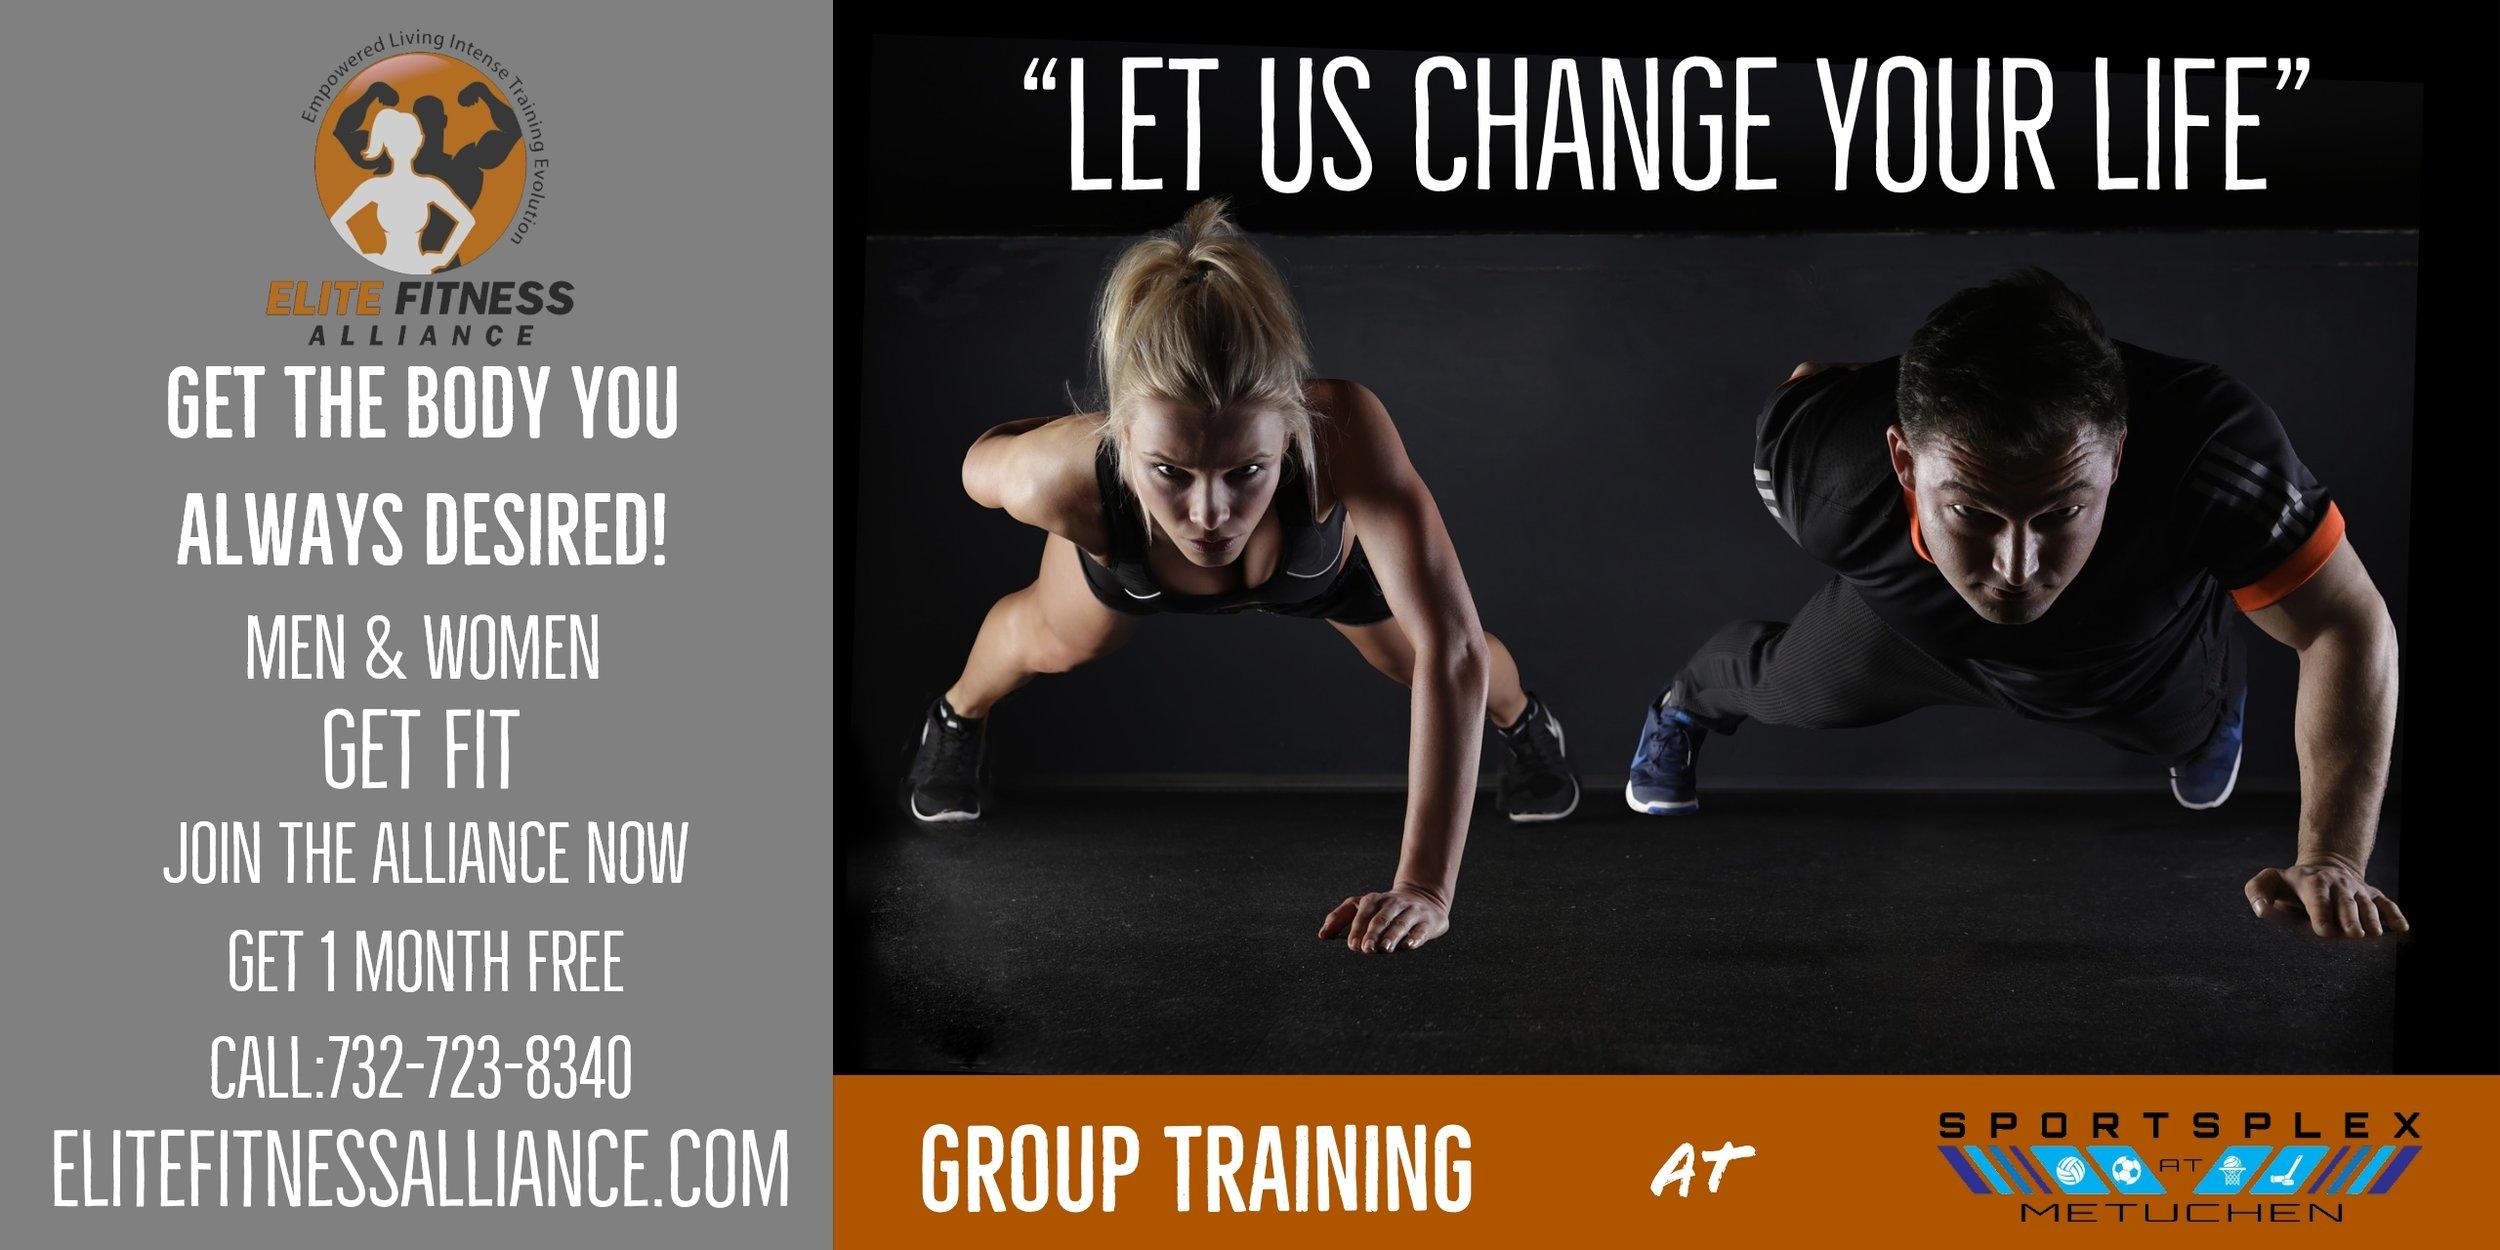 Elite Fitness Alliance